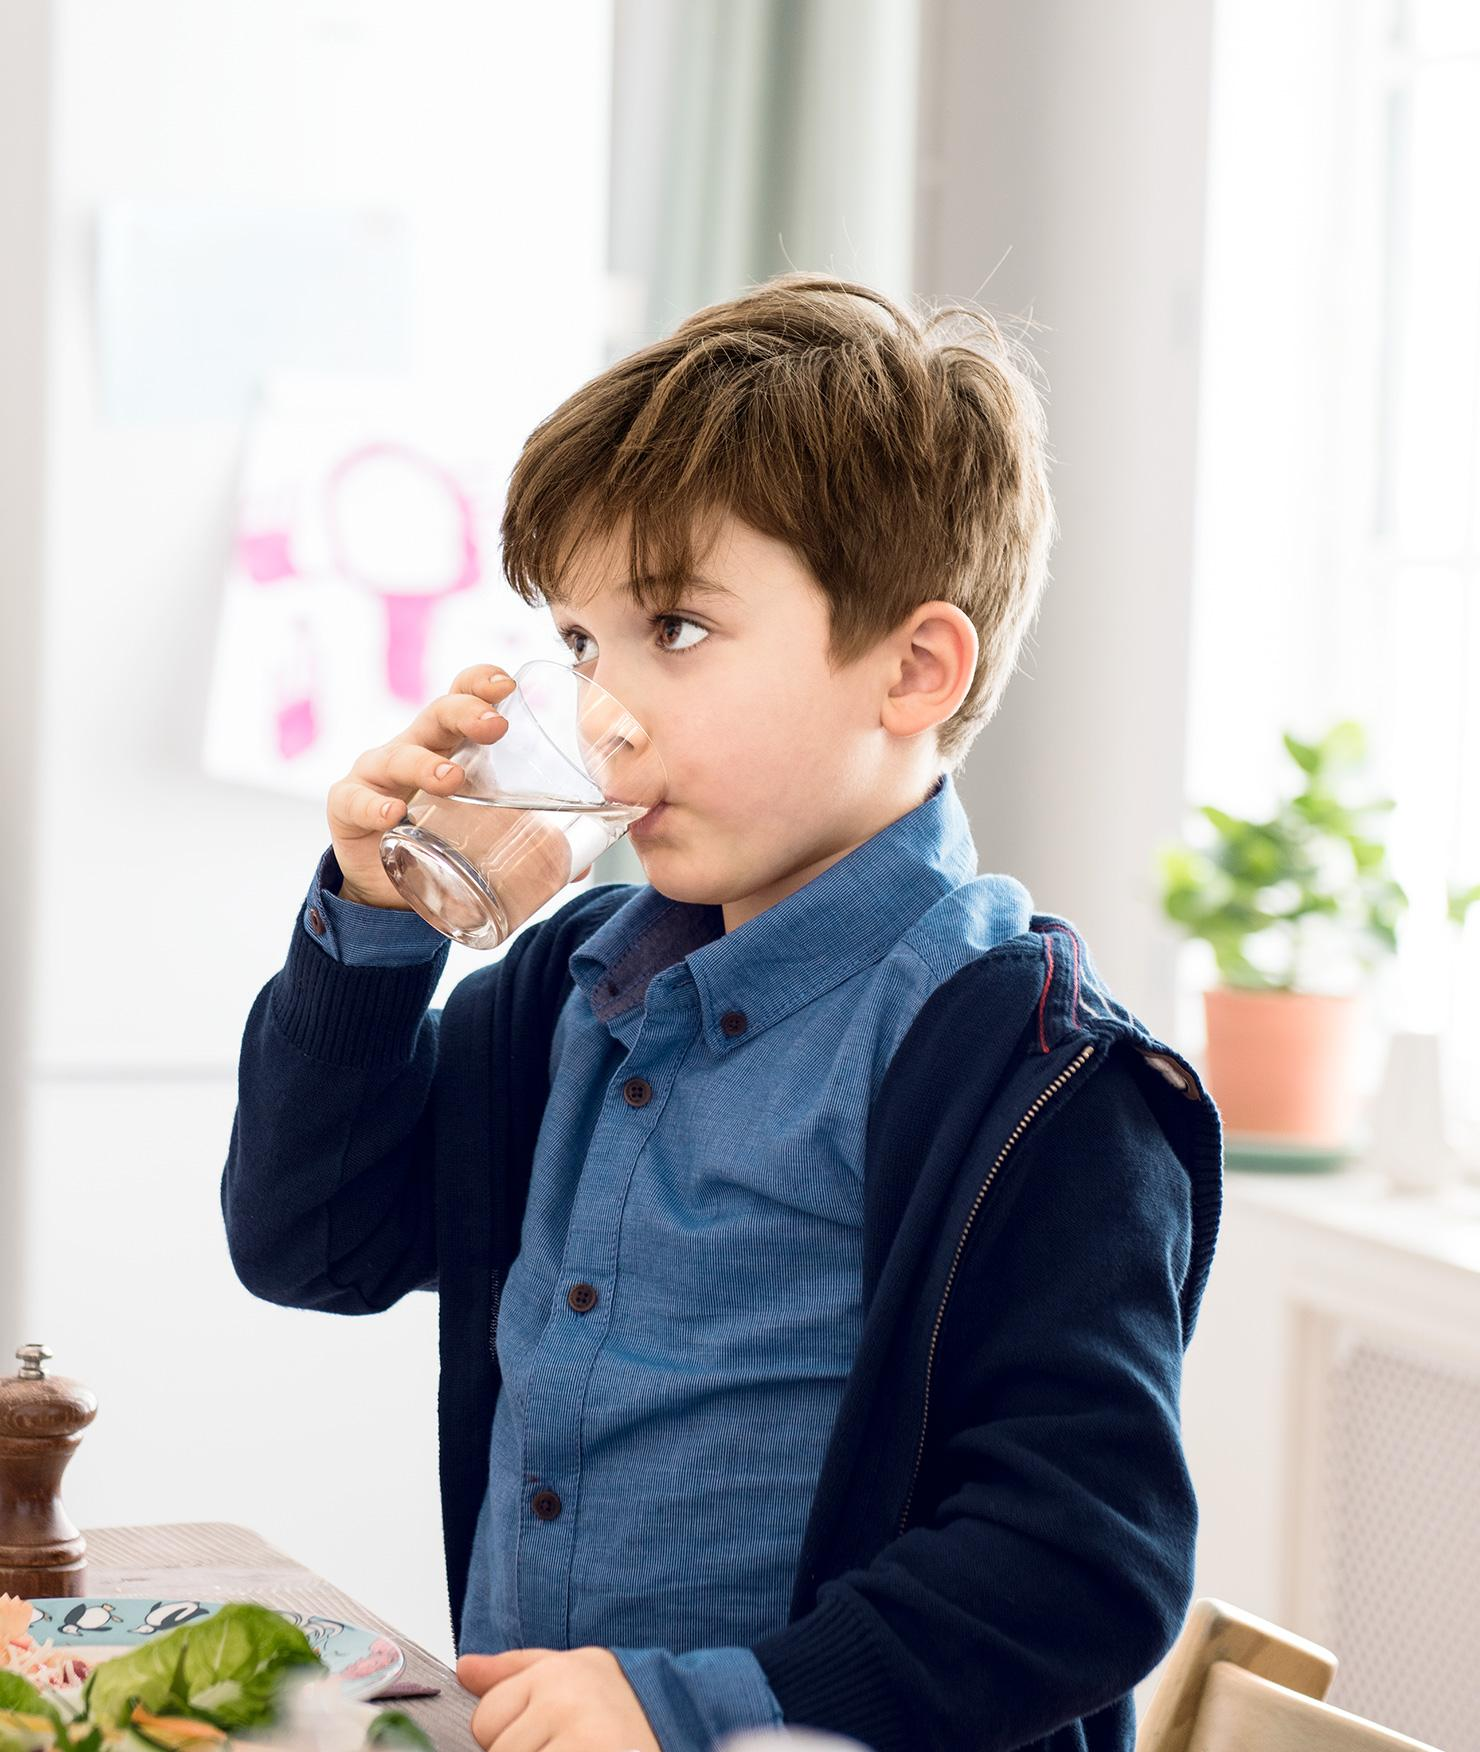 BRITA personal hydration needs boy drinking water